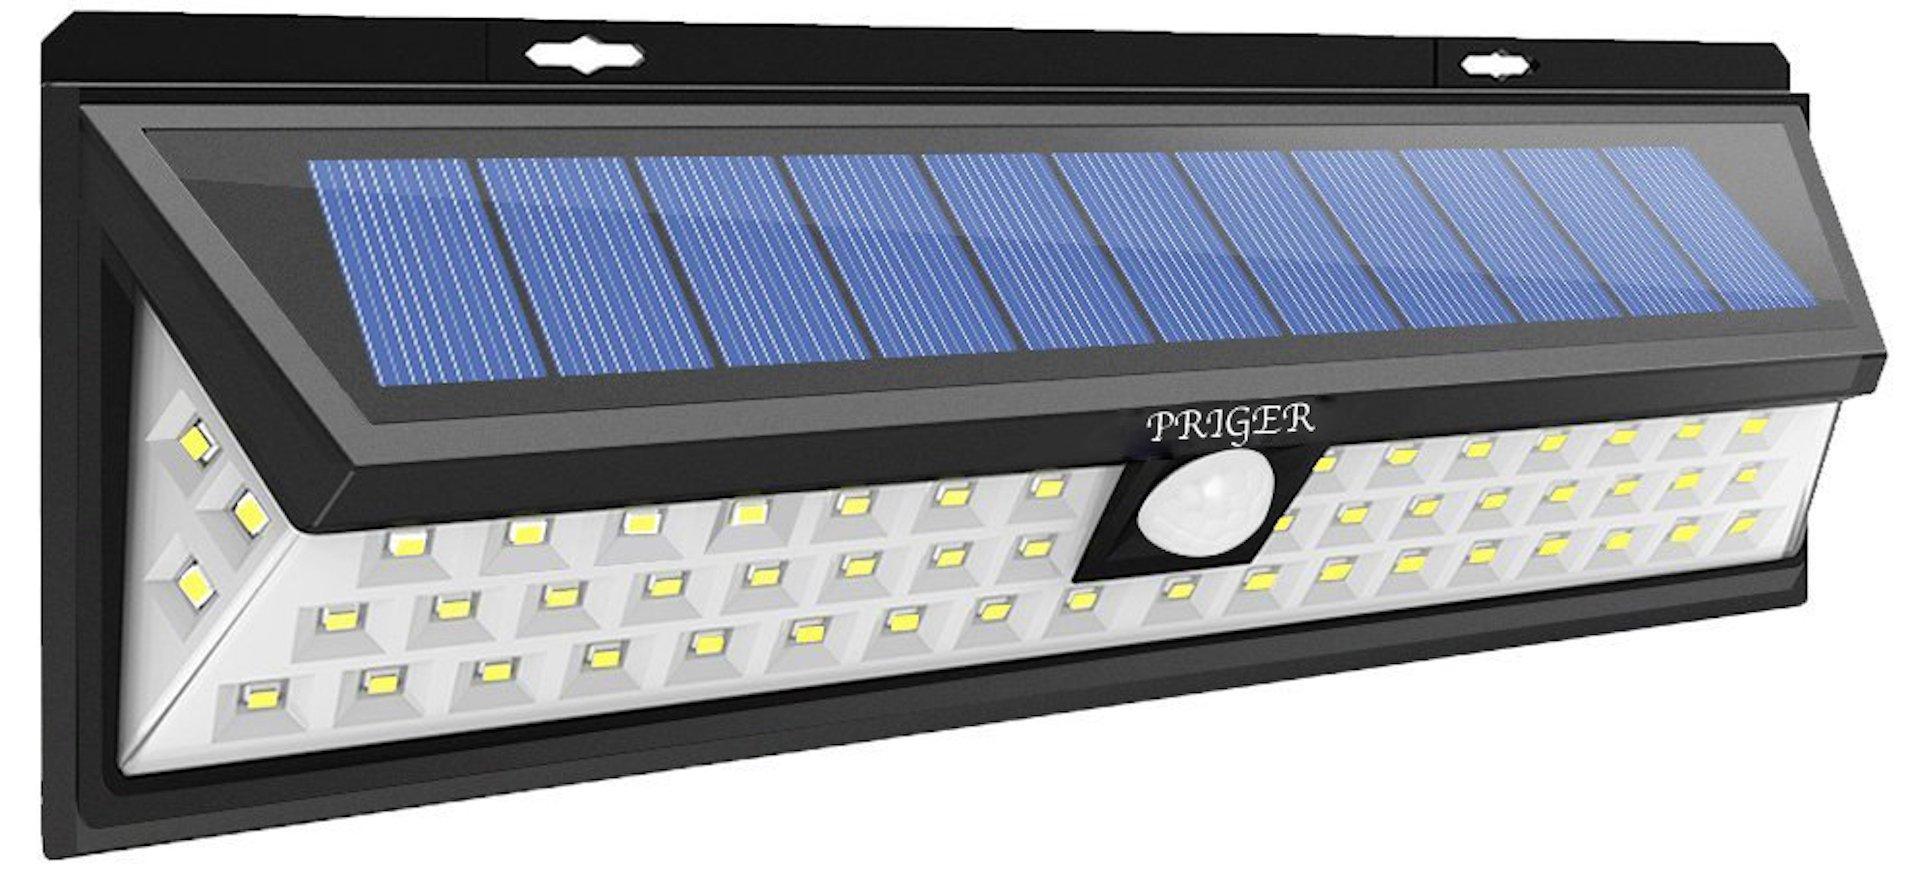 Priger Solar Lights Outdoor Motion Sensor Security Light - Outside LED Flood / Spotlight for Patio, Garden, Deck, Pathway - Waterproof Wireless Solar Powered Yard Lighting / Wall Light